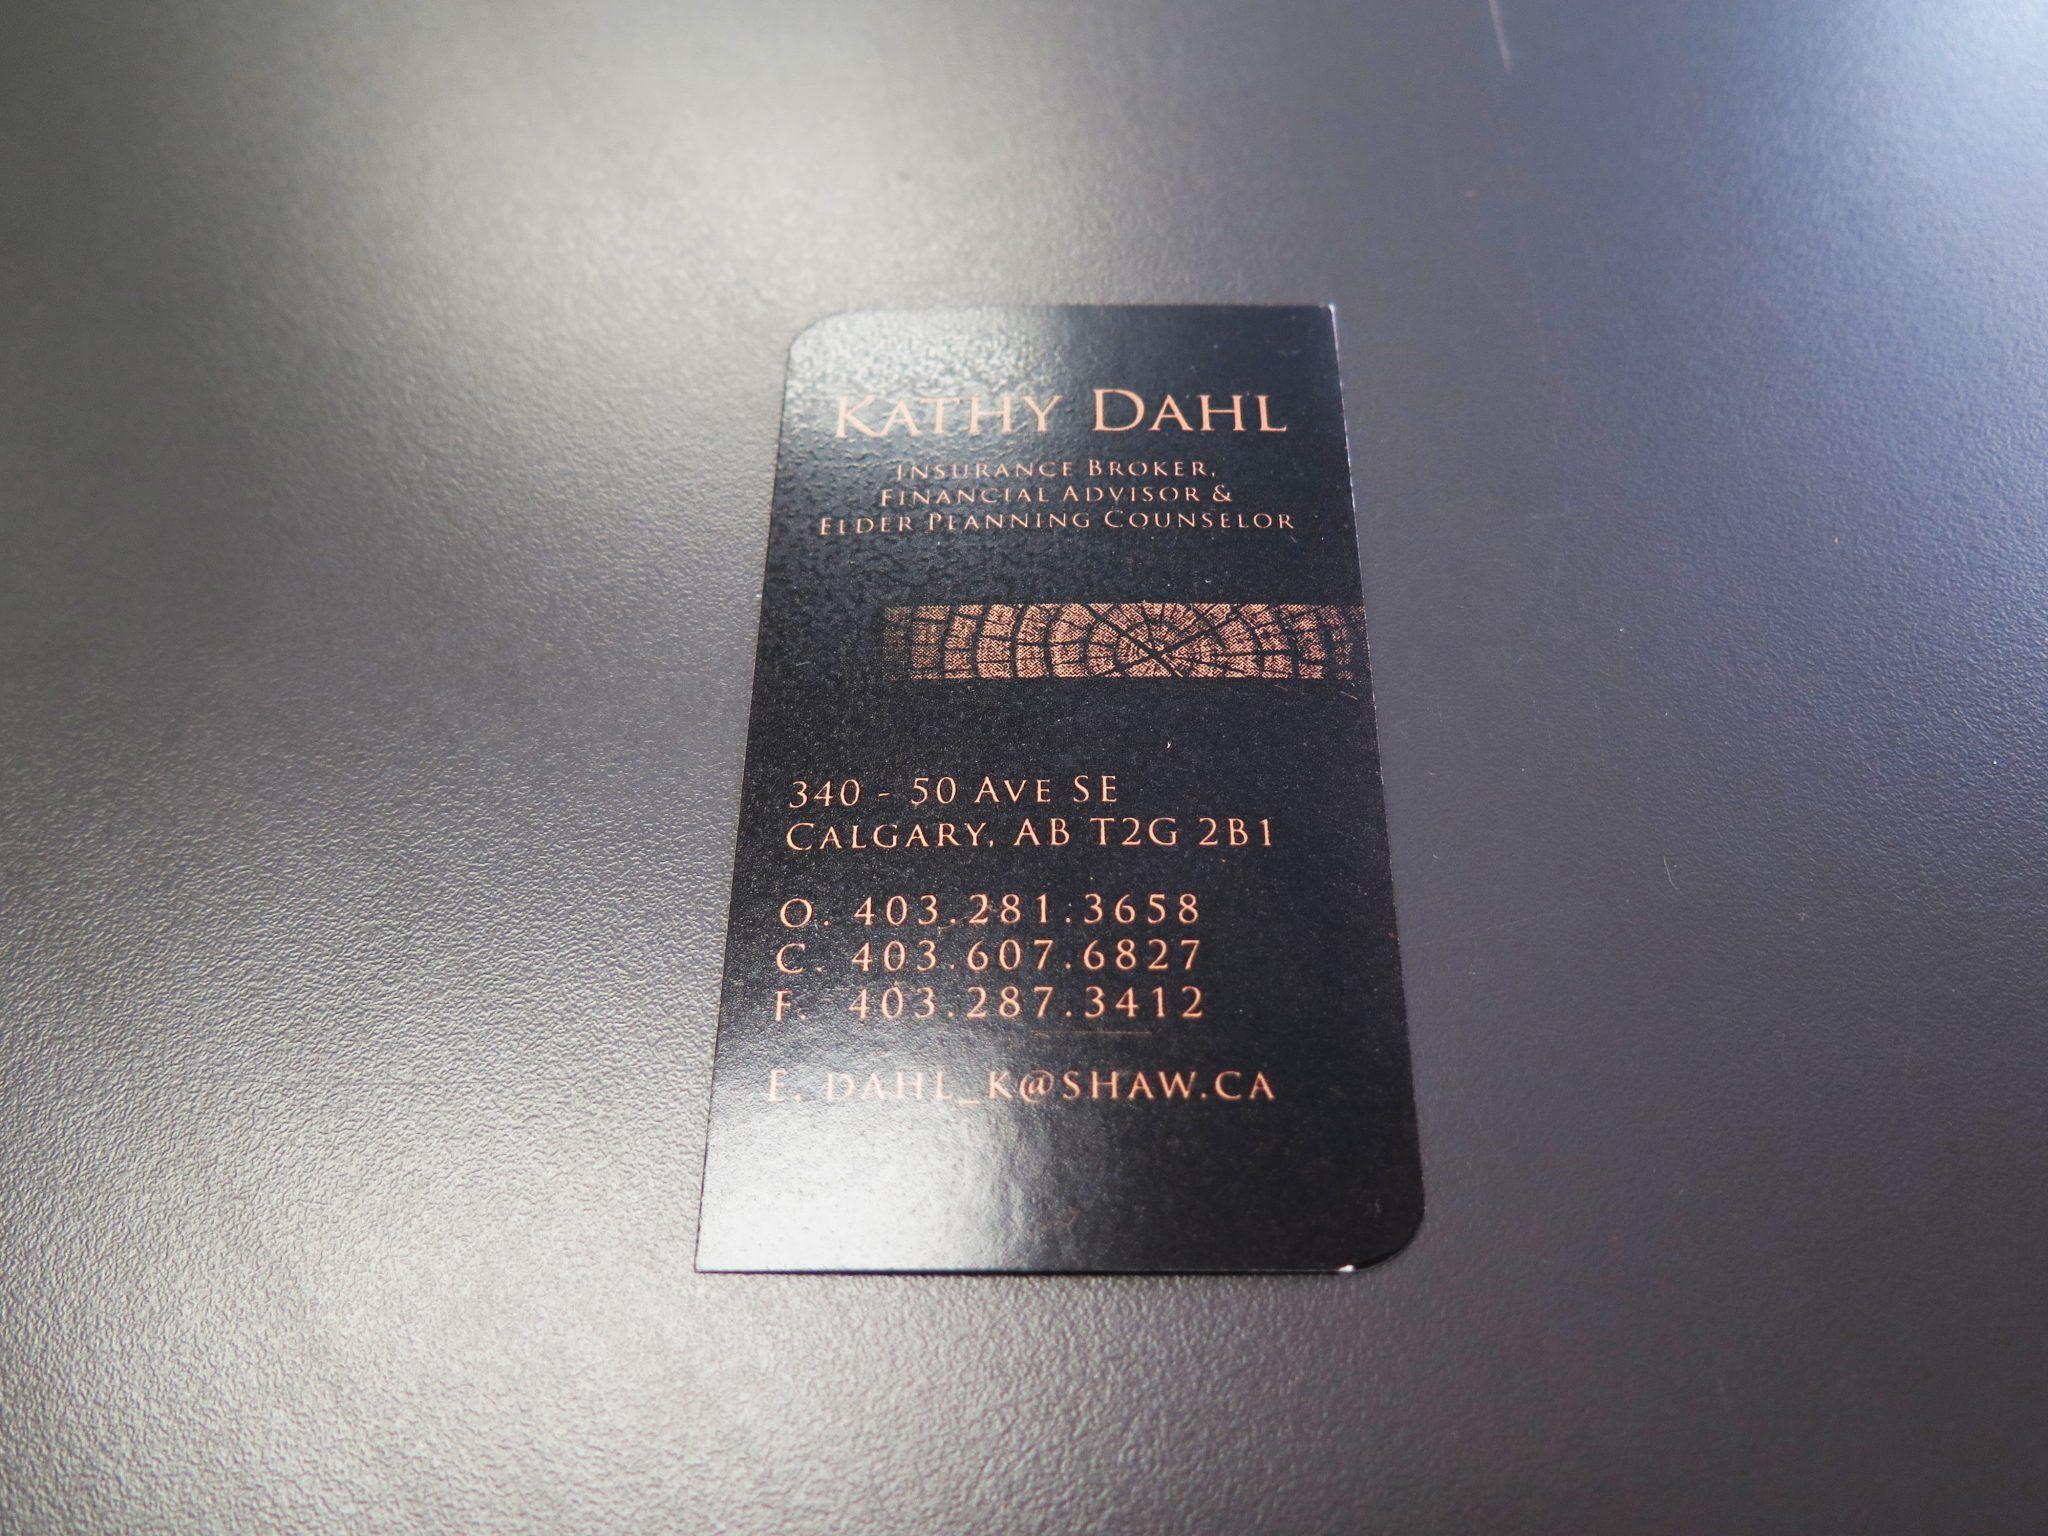 Plastic Business Cards Minuteman Press